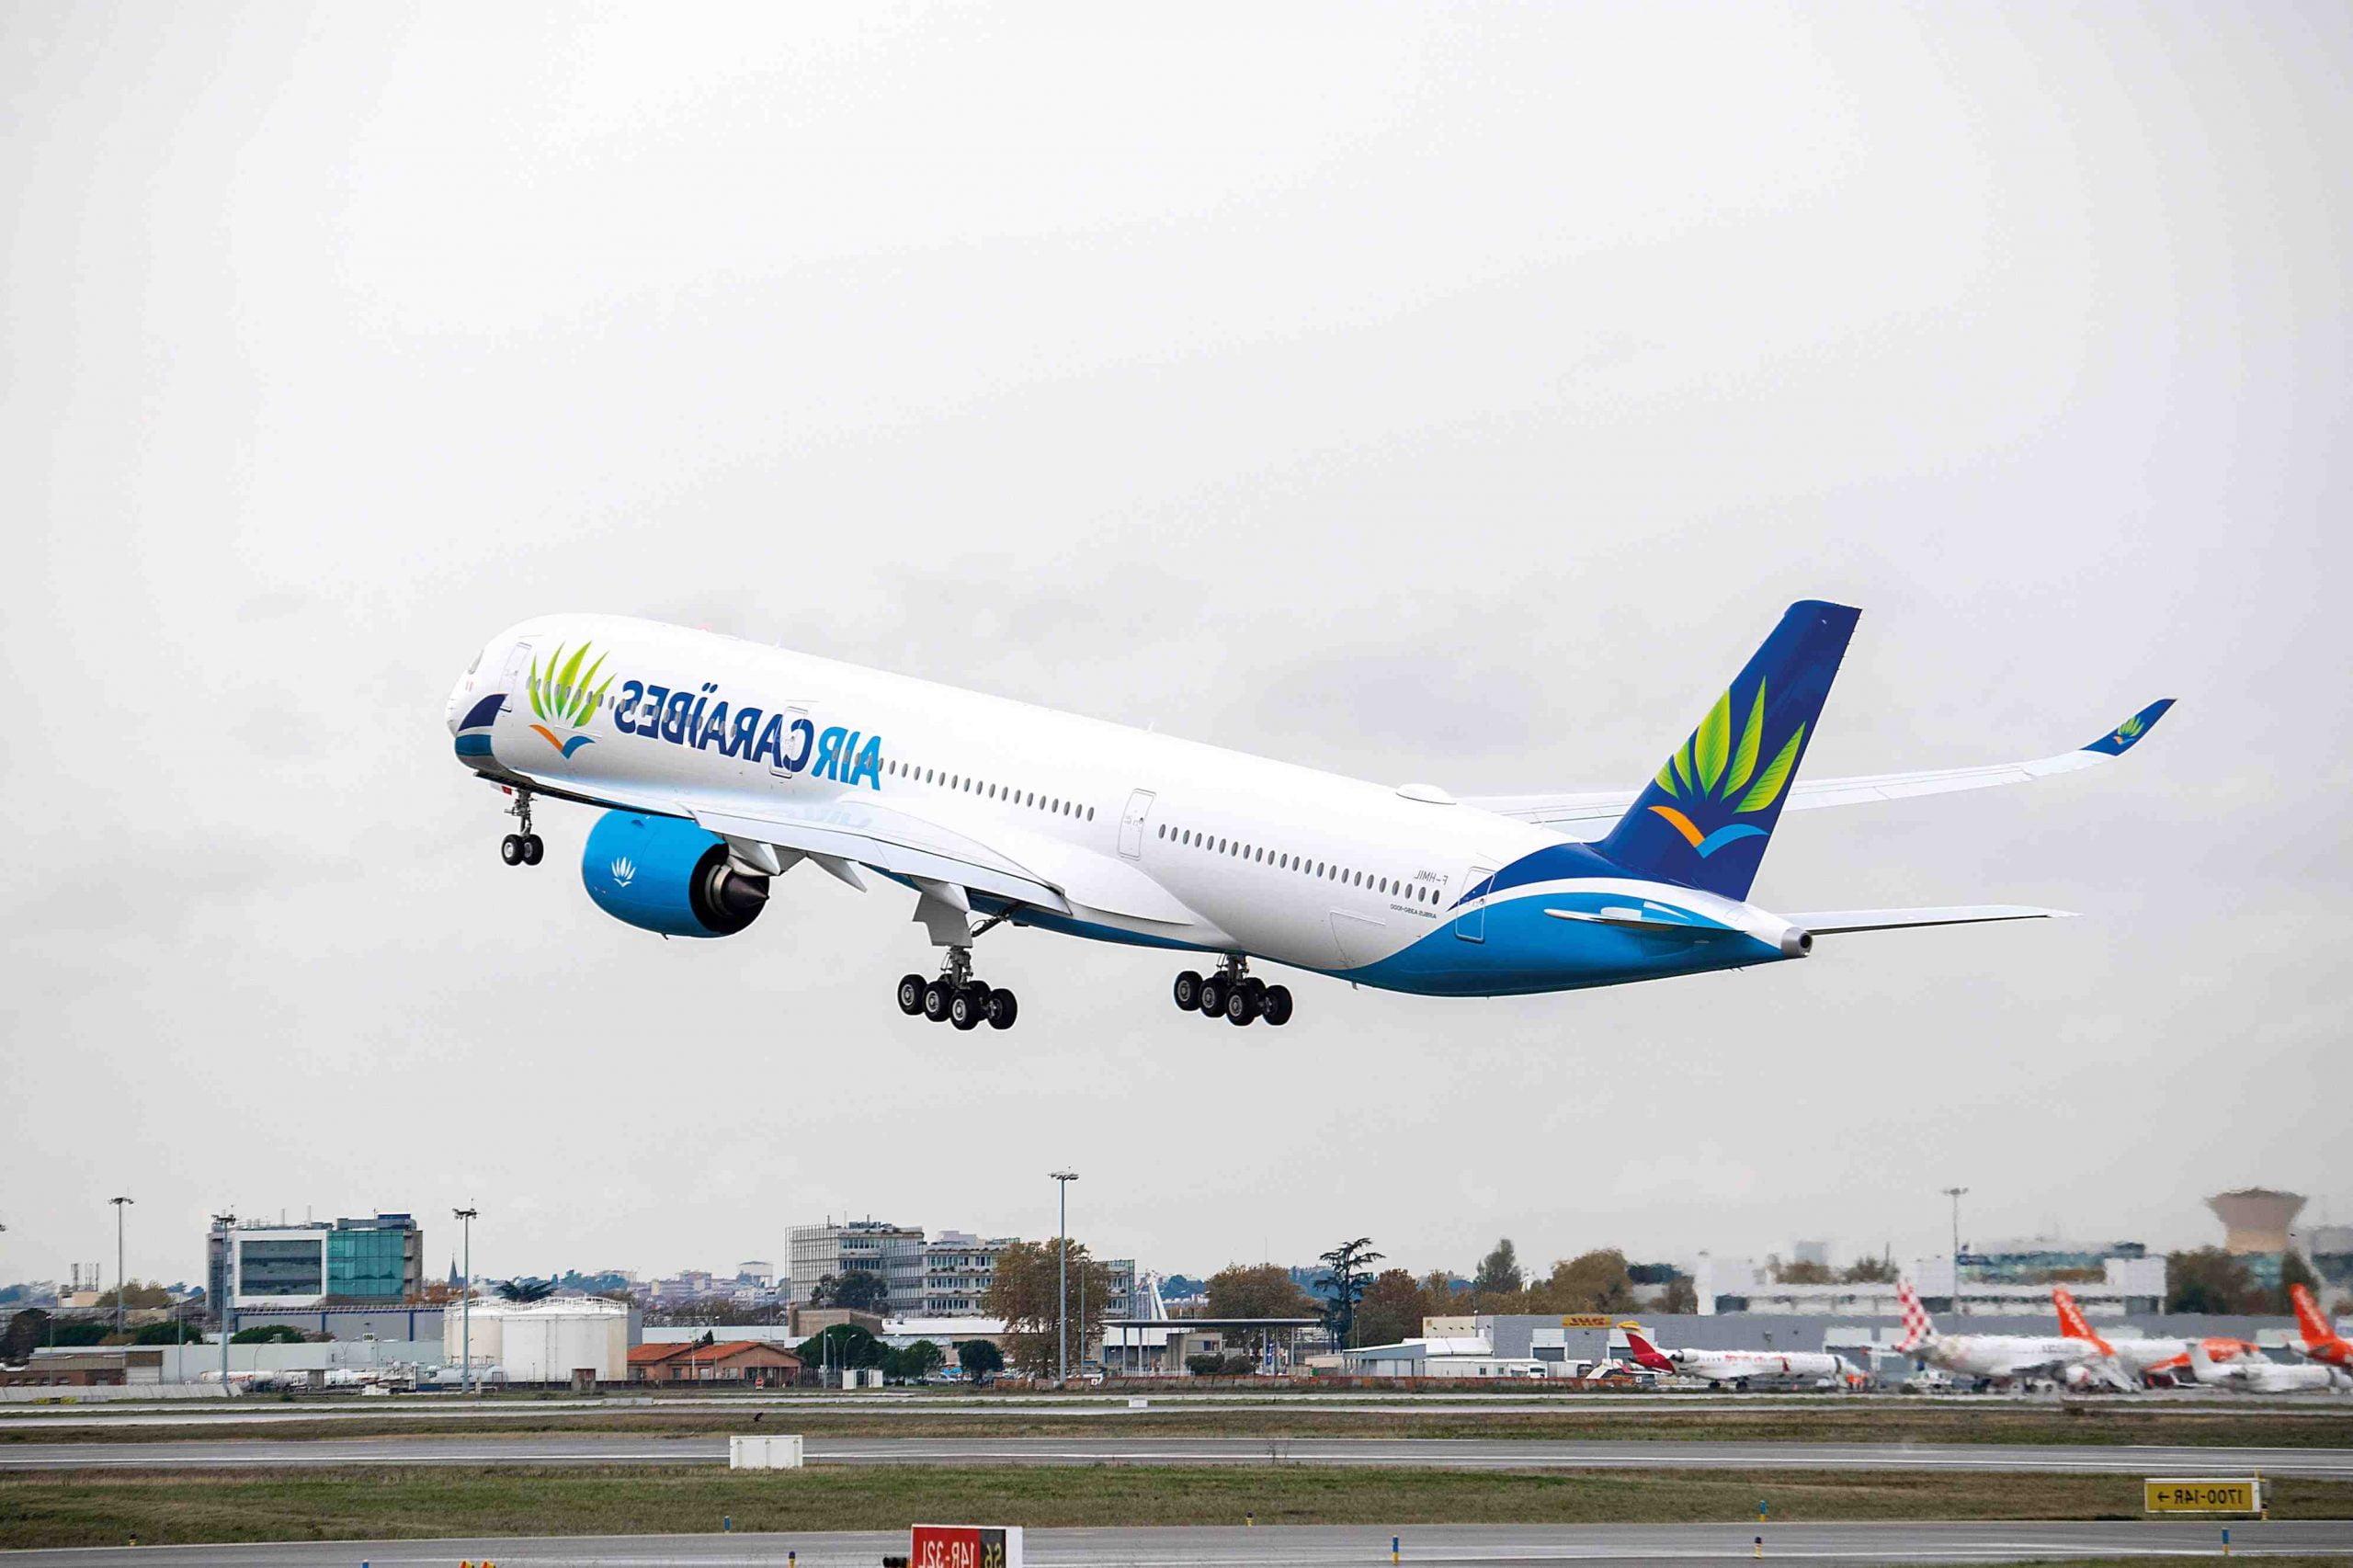 Quel est le prix d'un vol vers la Guadeloupe?